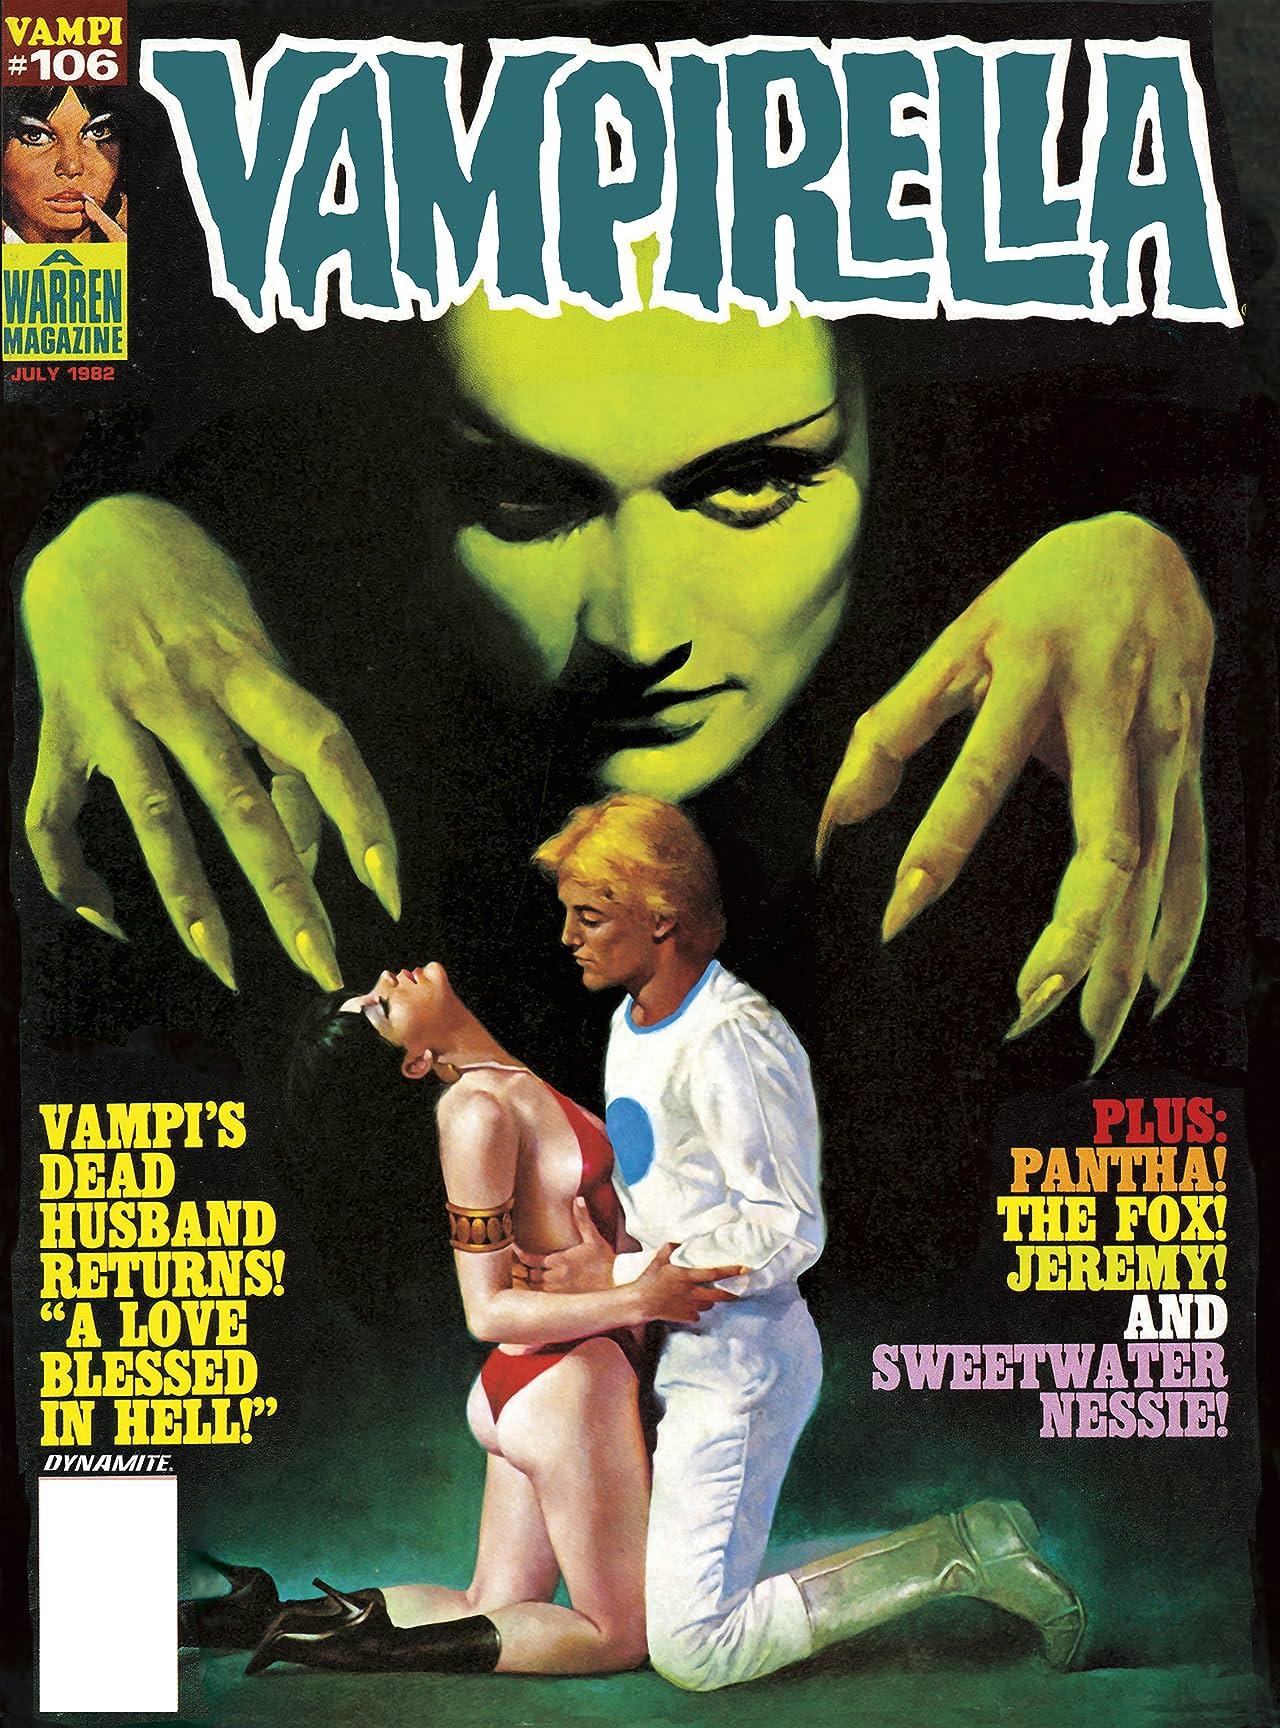 Vampirella (Magazine 1969-1983) #106